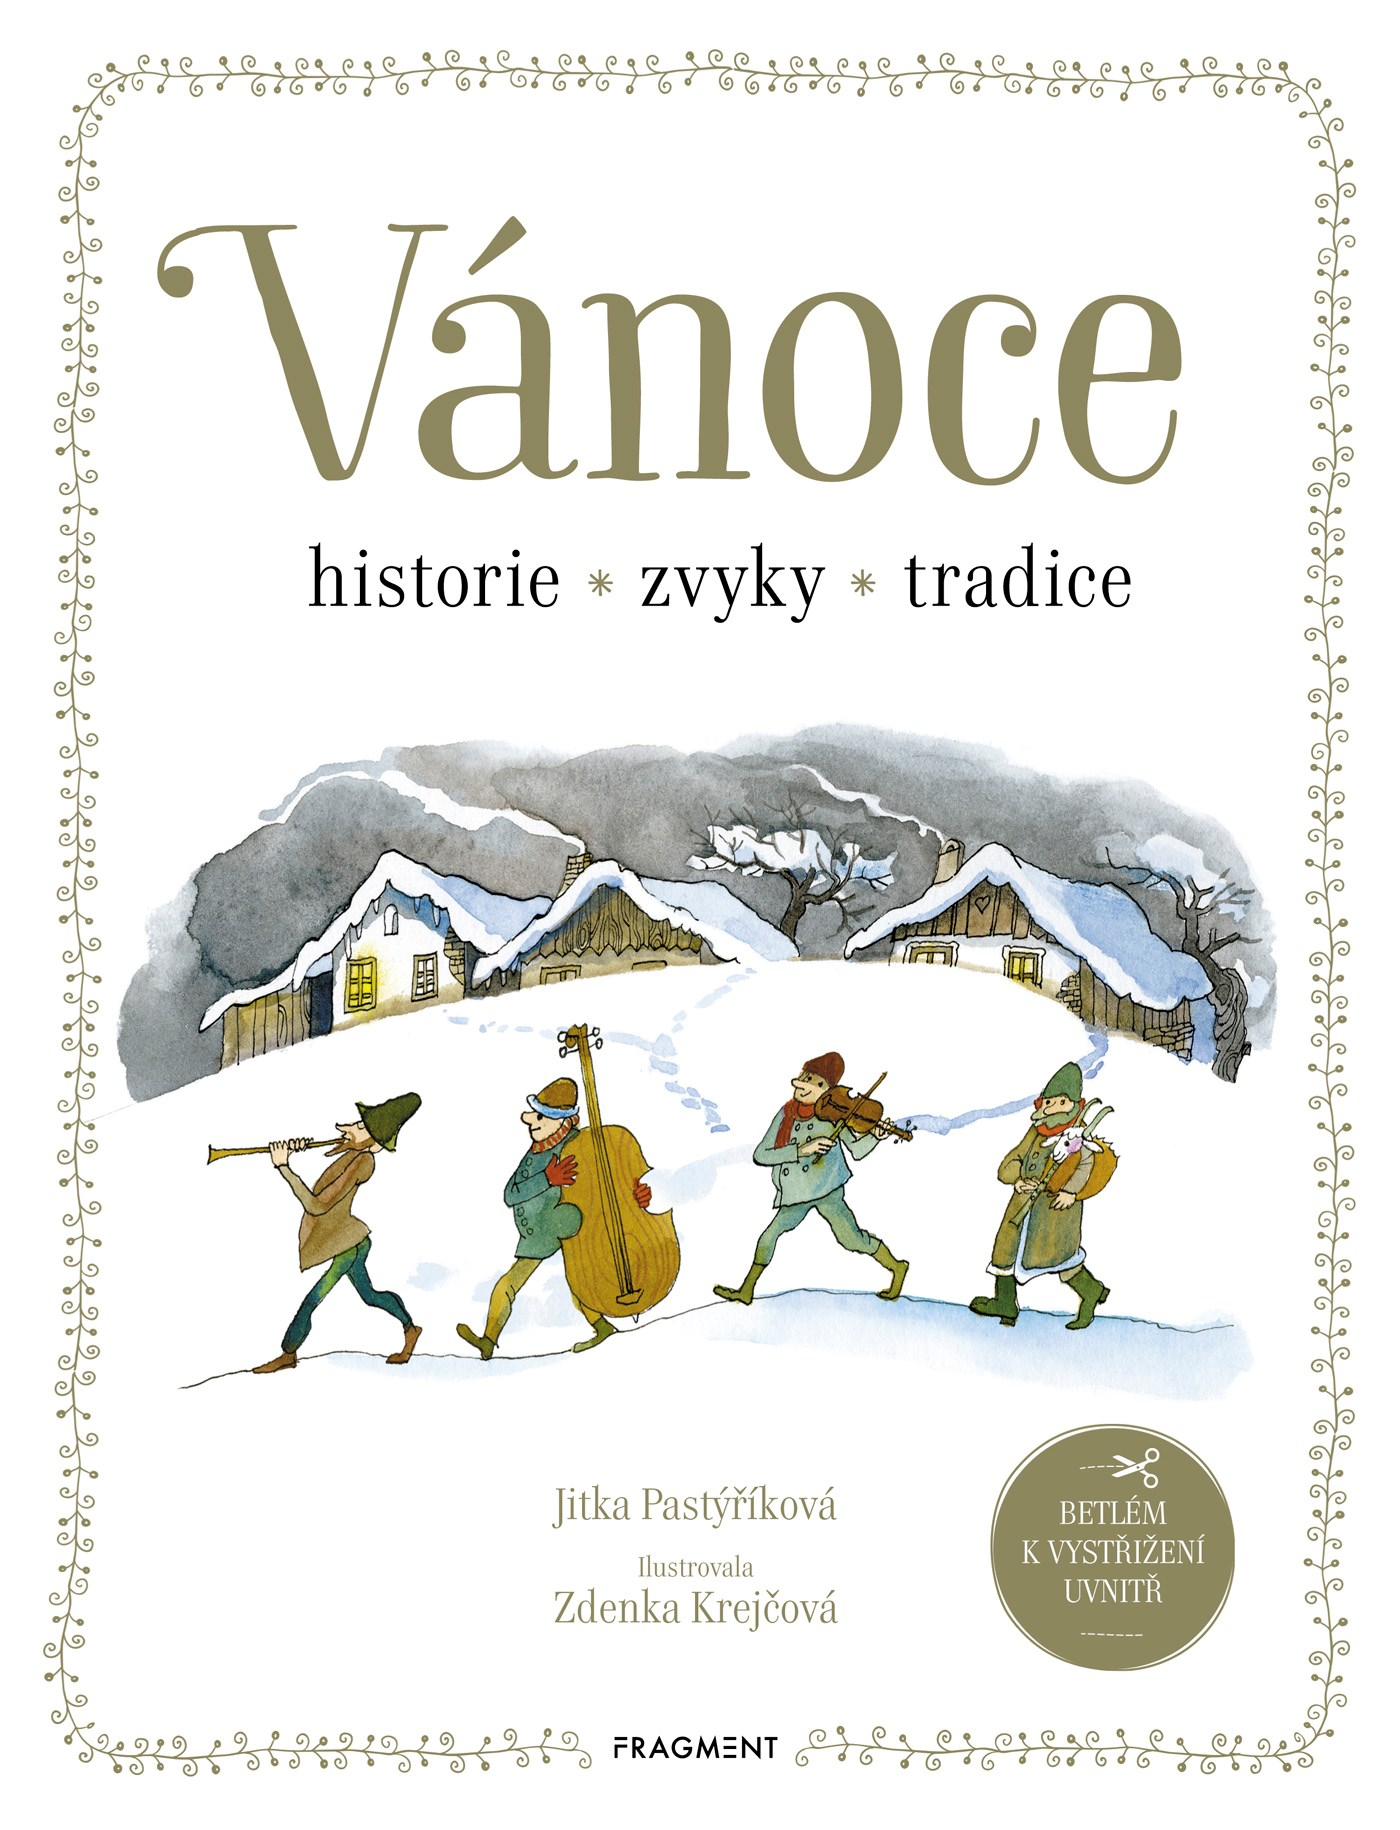 VÁNOCE - HISTORIE, ZVYKY, TRADICE